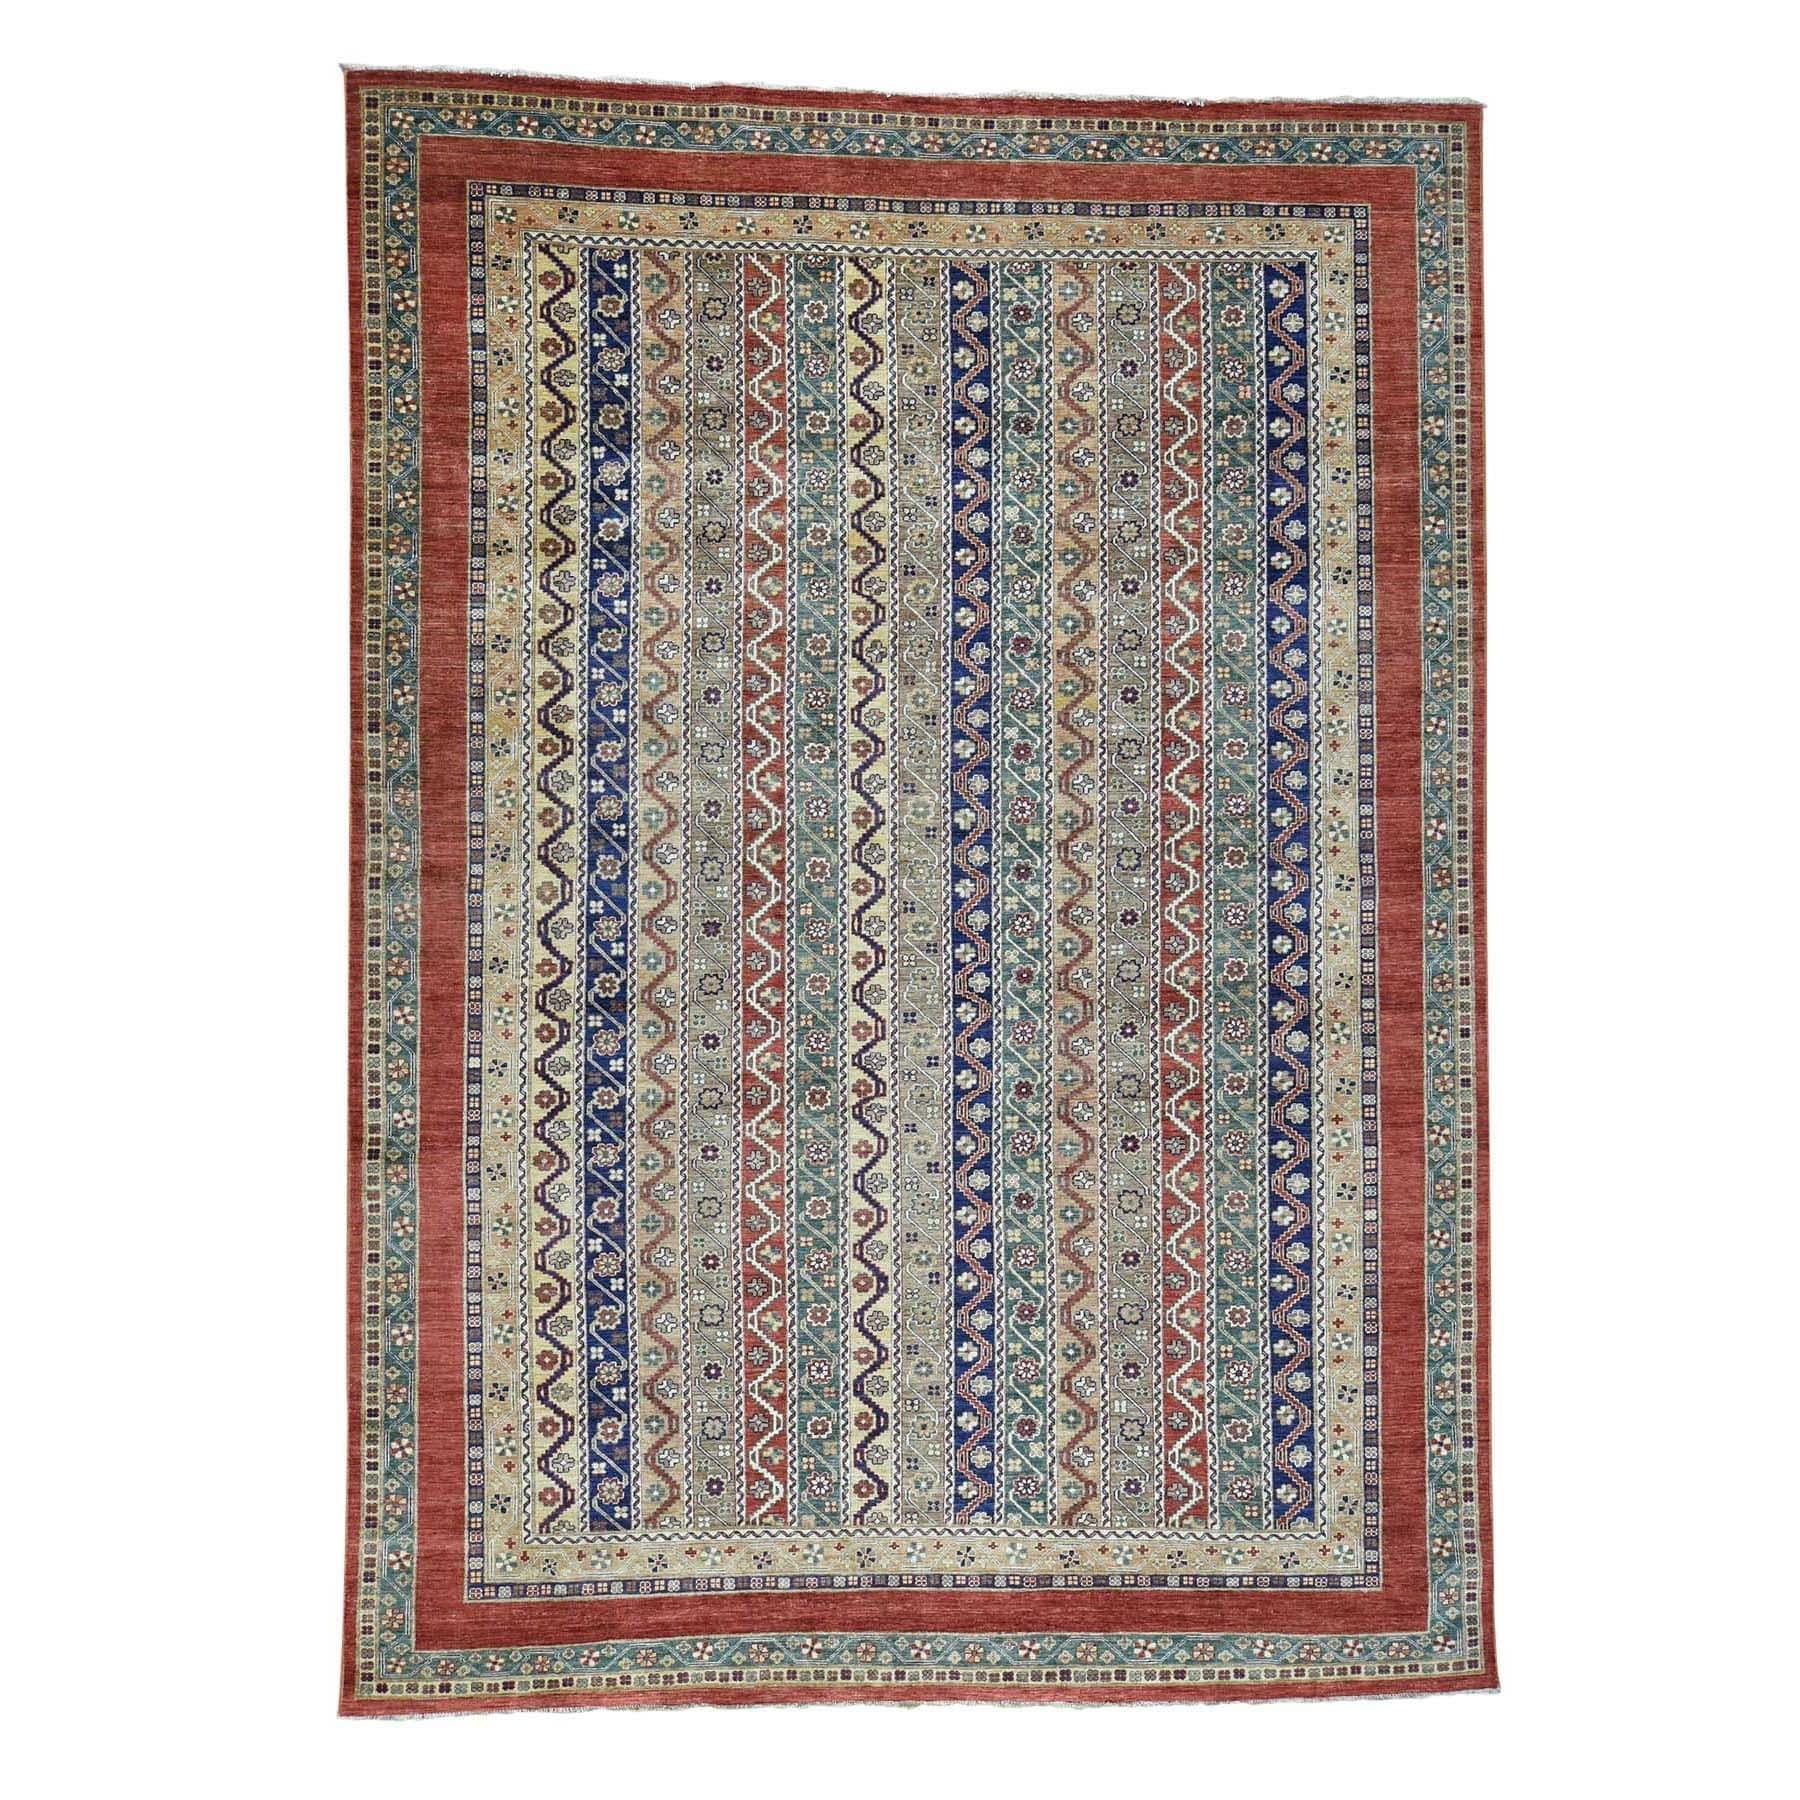 Shahbanu Rugs Super Kazak Khorjin Shawl Design Hand Knotted Pure Wool Rug 10 X 14 Multi